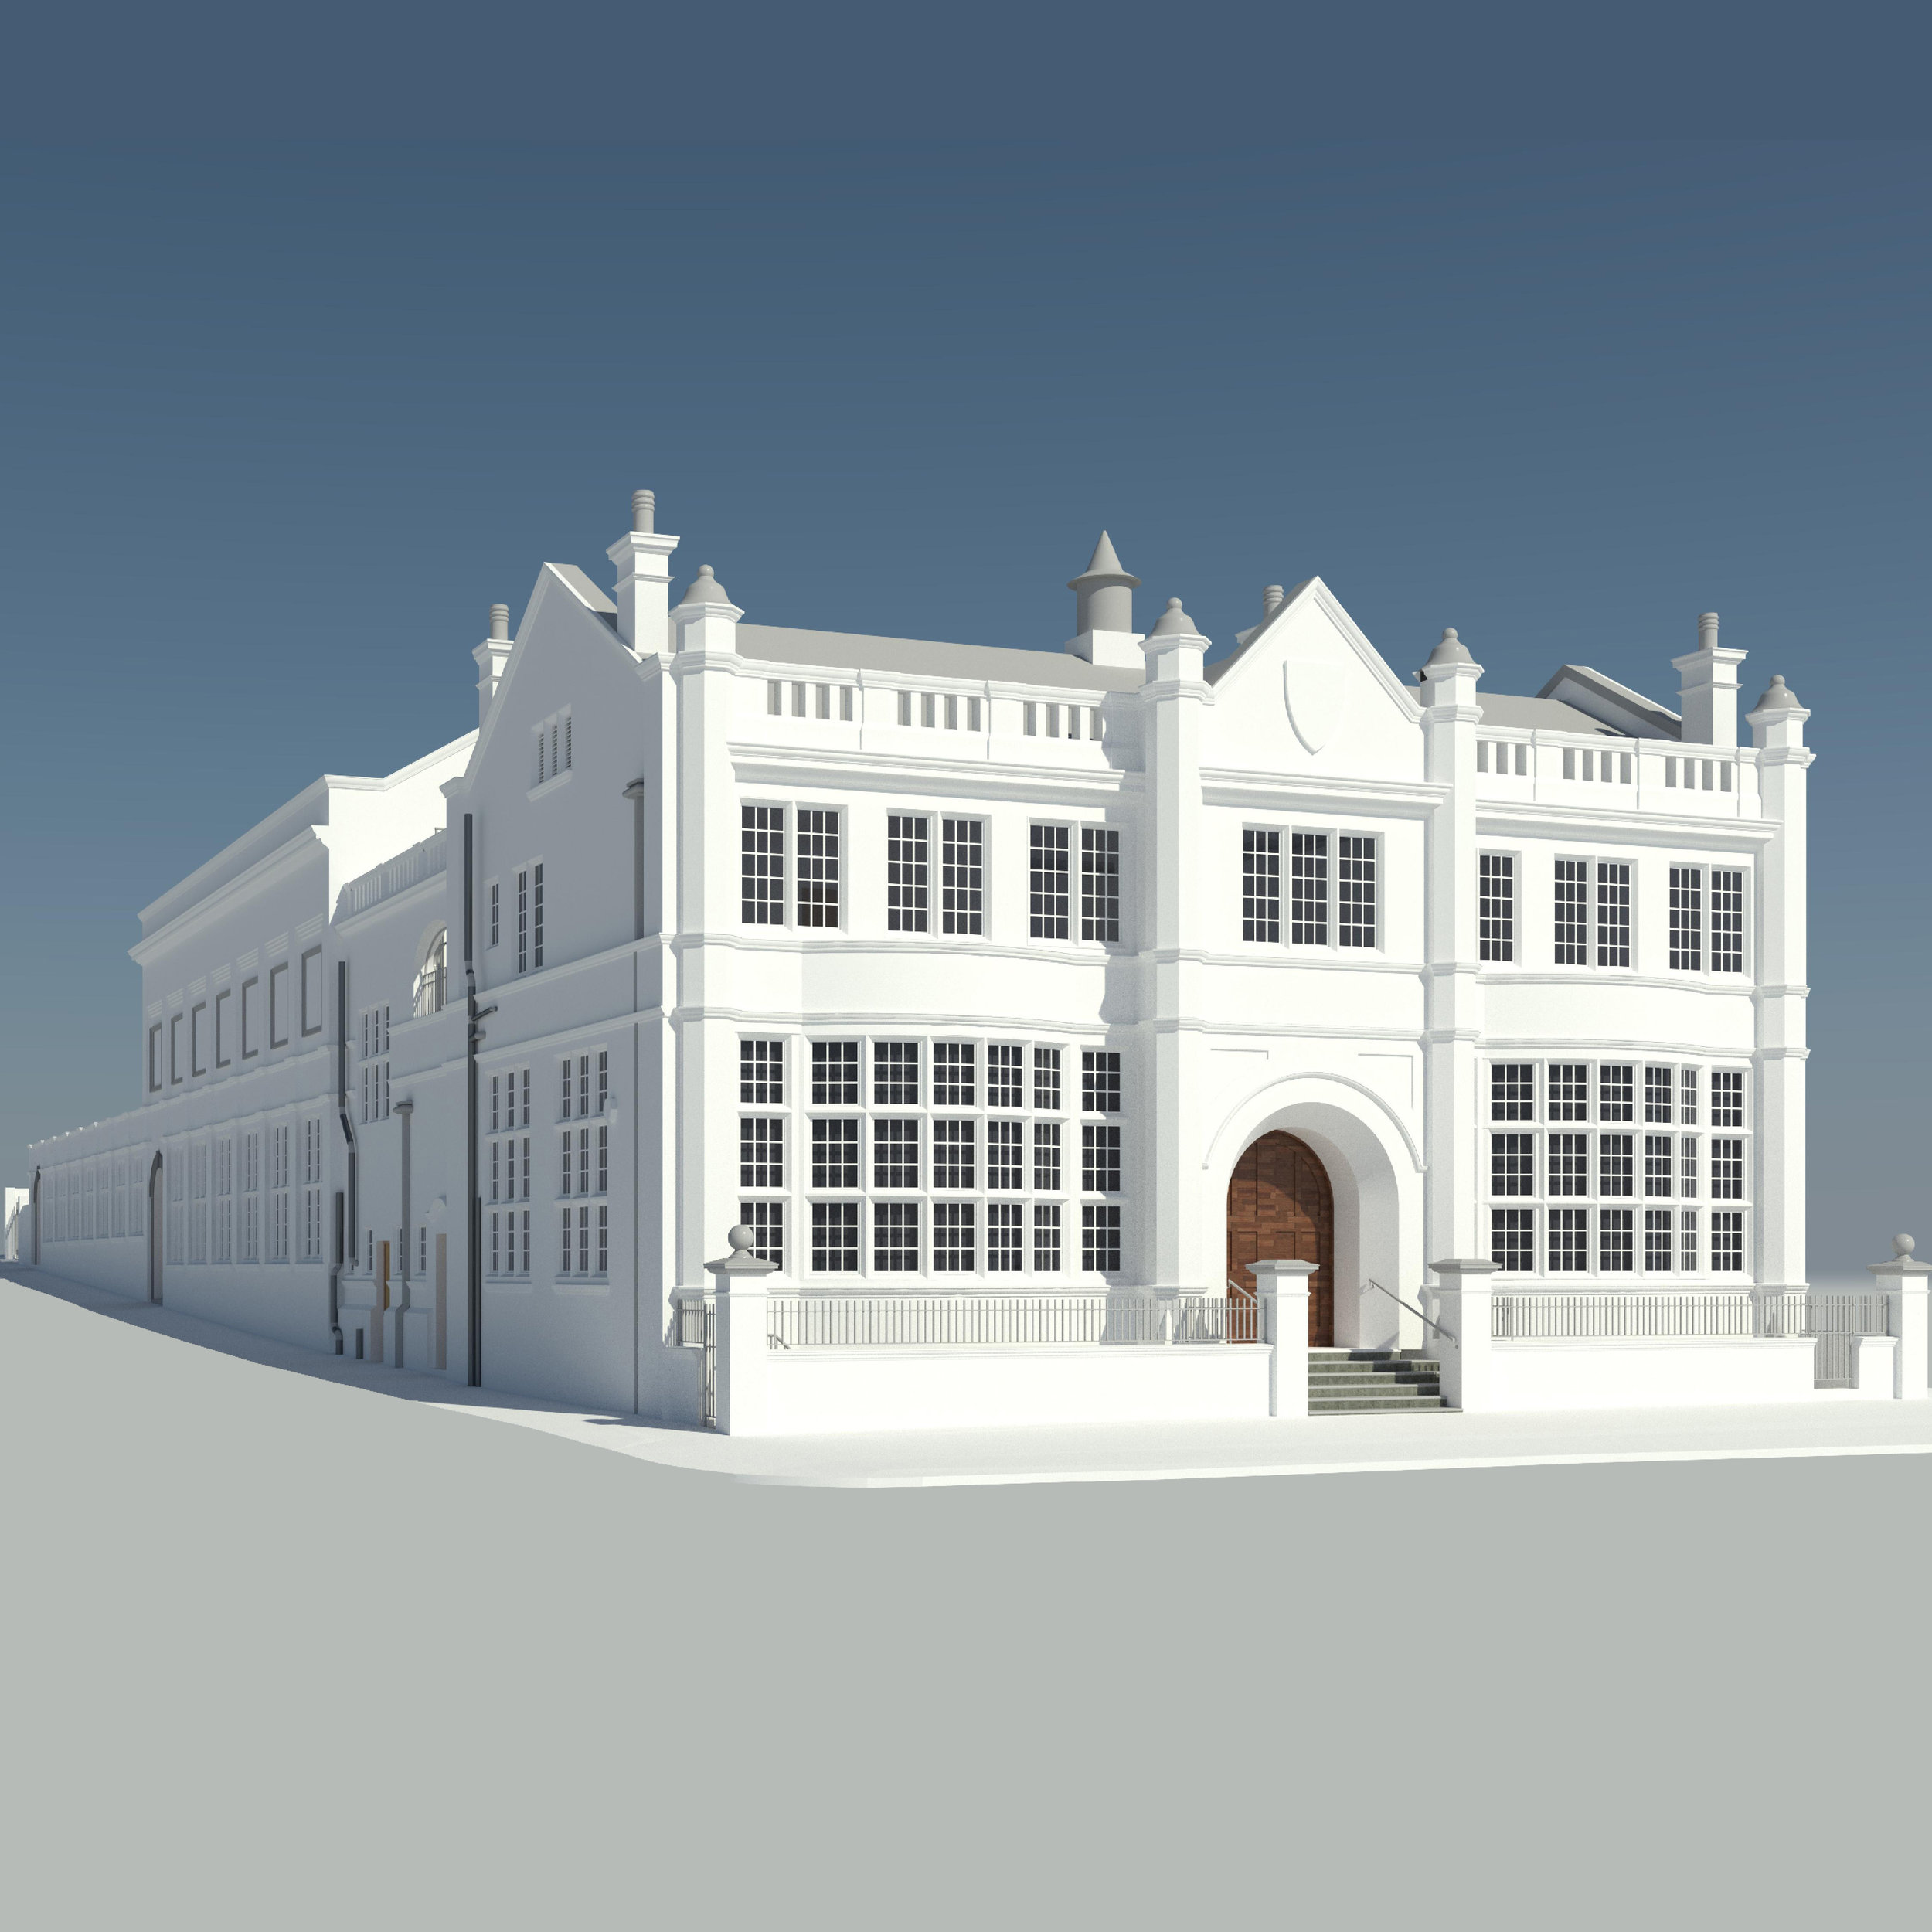 Plumstead Library - Sector: HeritageLocation: LondonOur Client: GleedsEnd User: Hawkins Brown